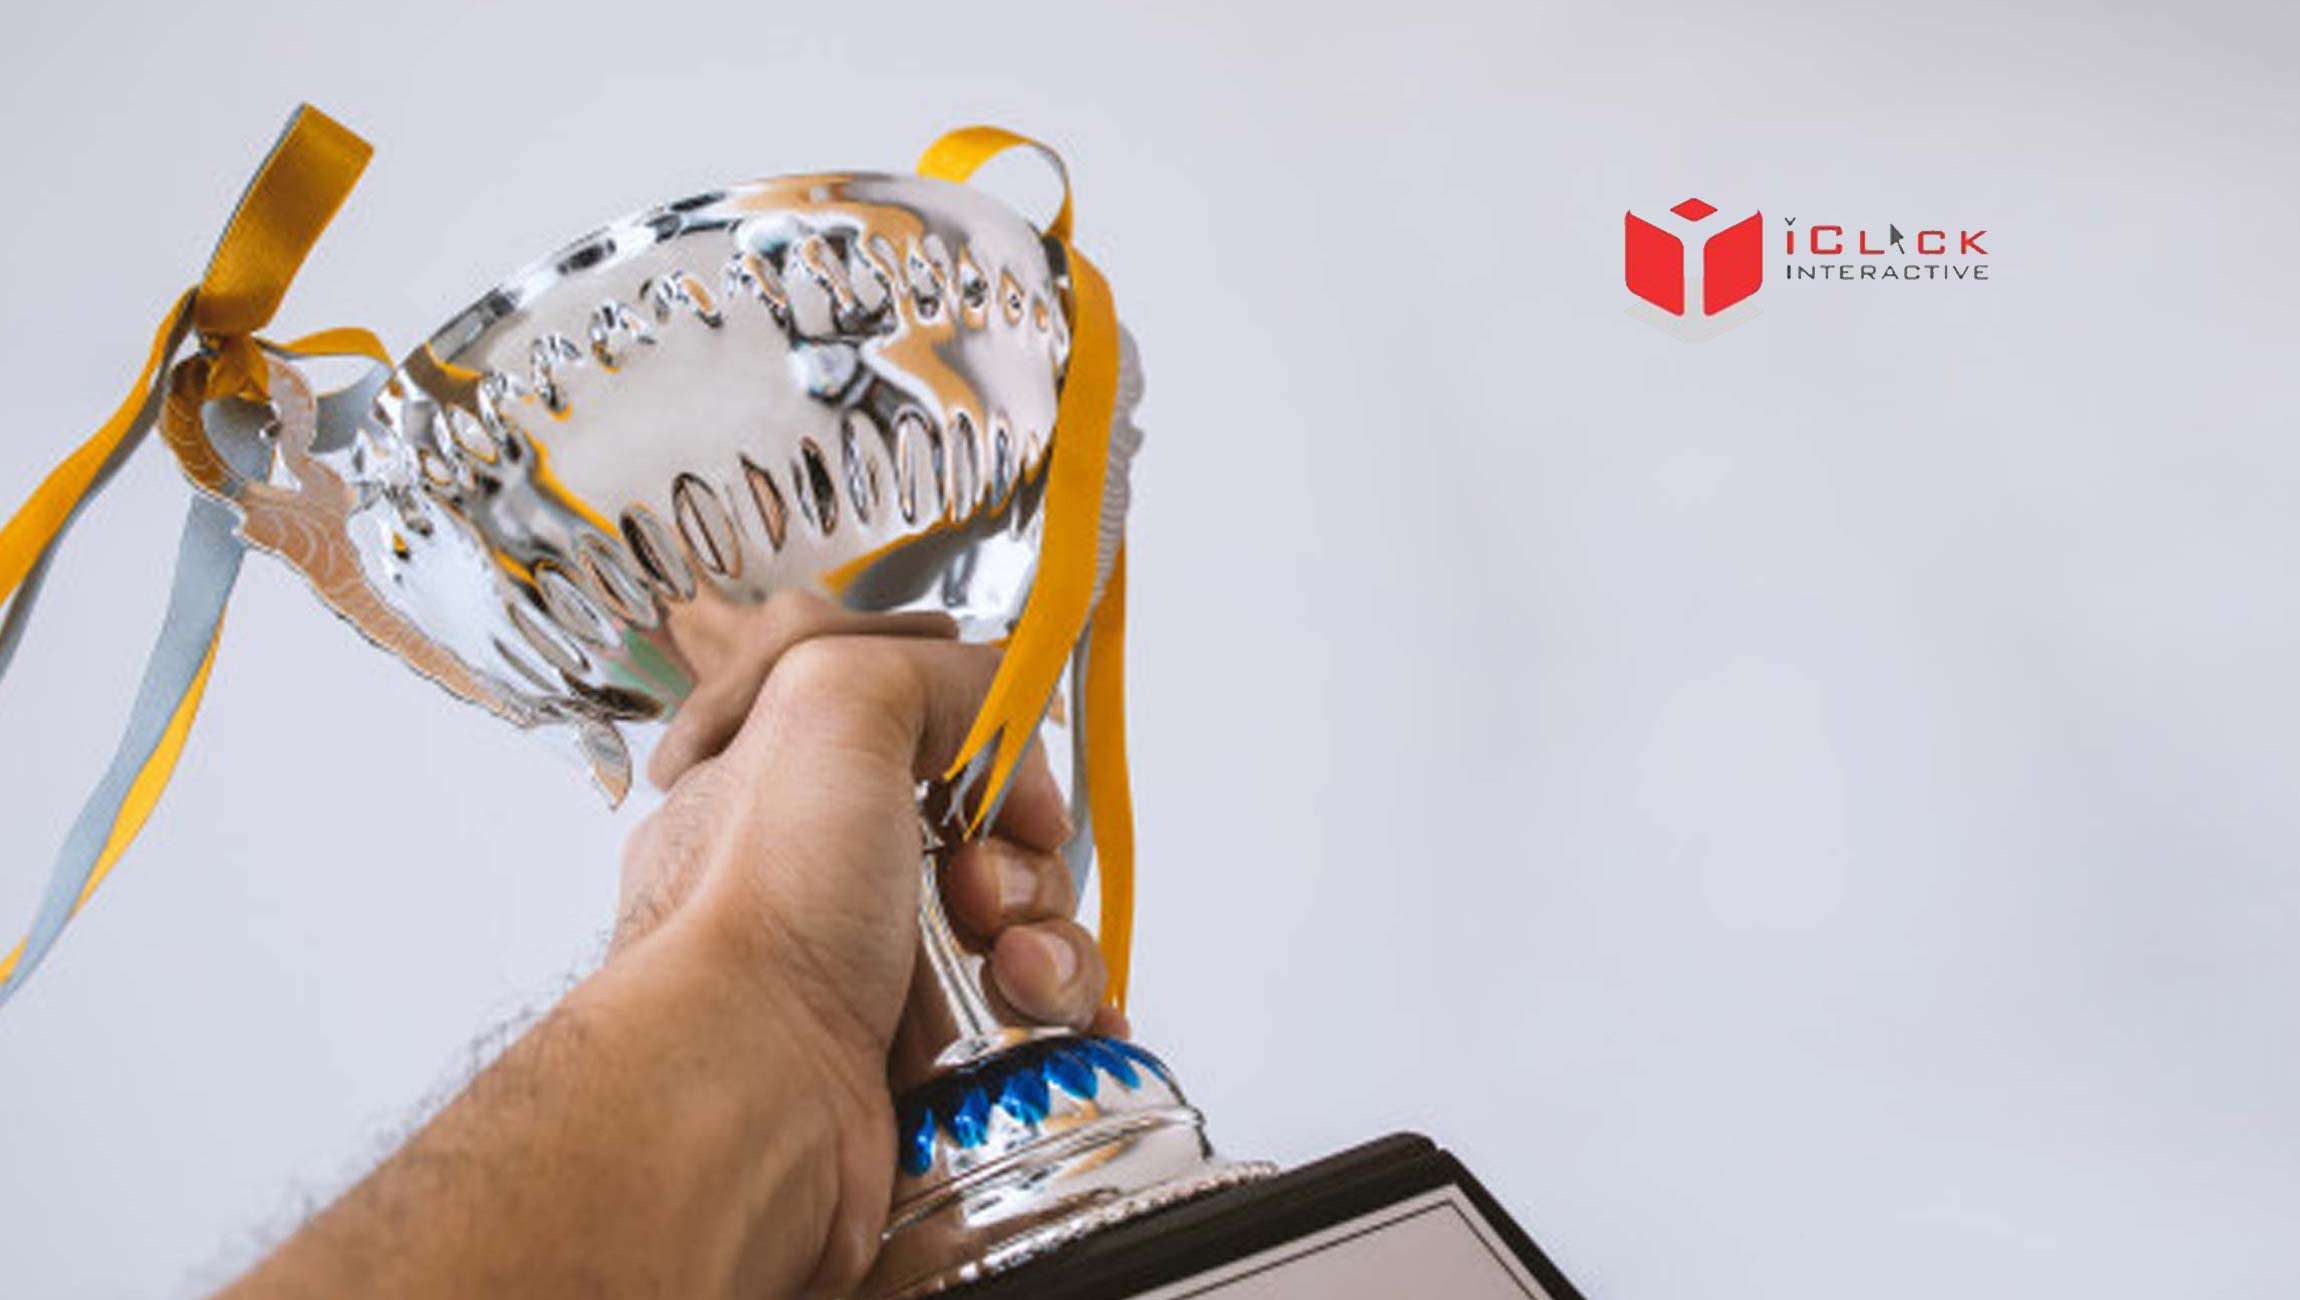 iClick Interactive Wins Five Awards at 2021 Asia-Pacific Stevie Awards 1